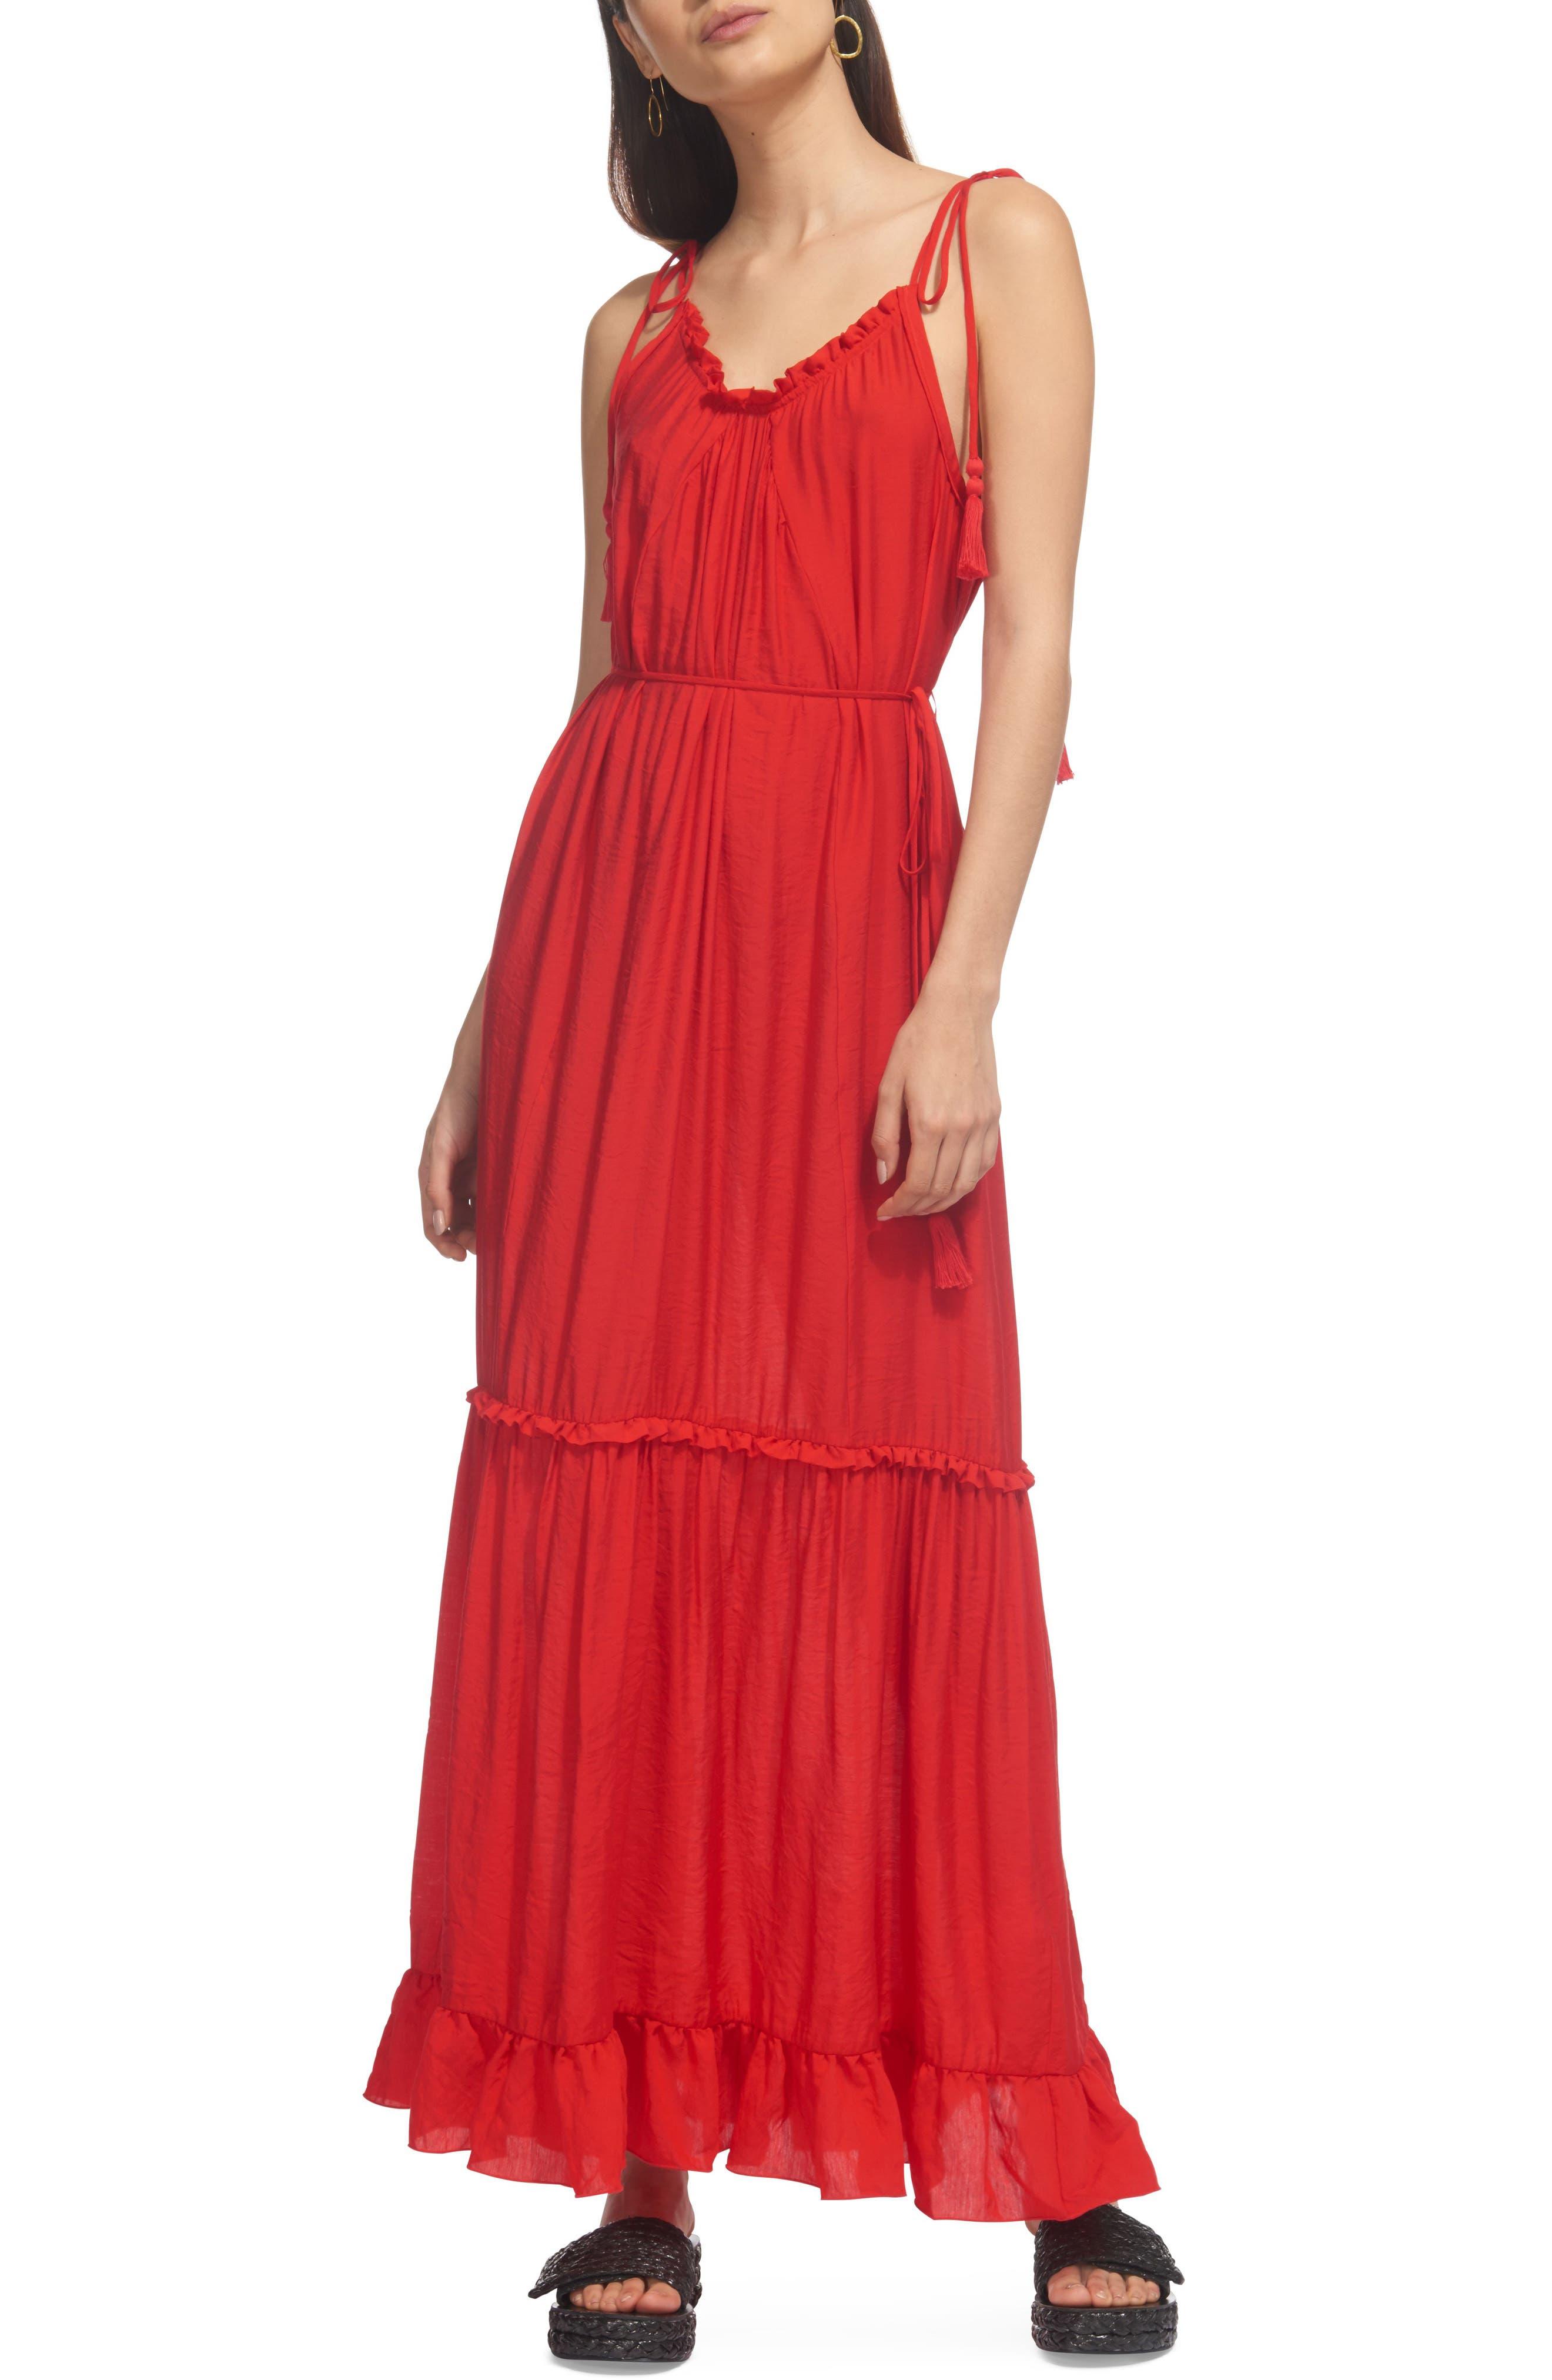 Tassel Tie Maxi Dress,                         Main,                         color, Red